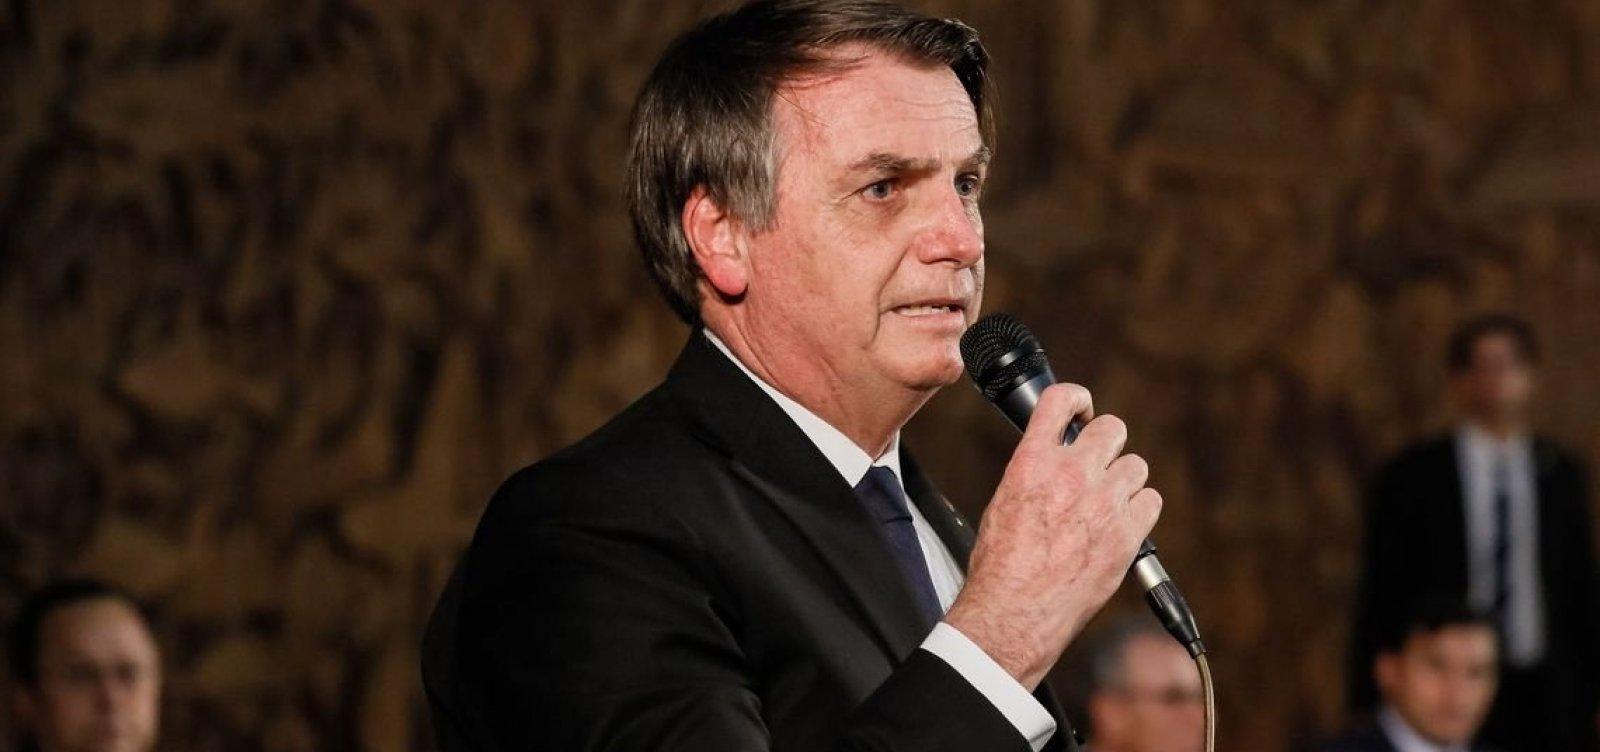 PF abre inquérito para apurar se porteiro cometeu crime ao citar Bolsonaro no caso Marielle